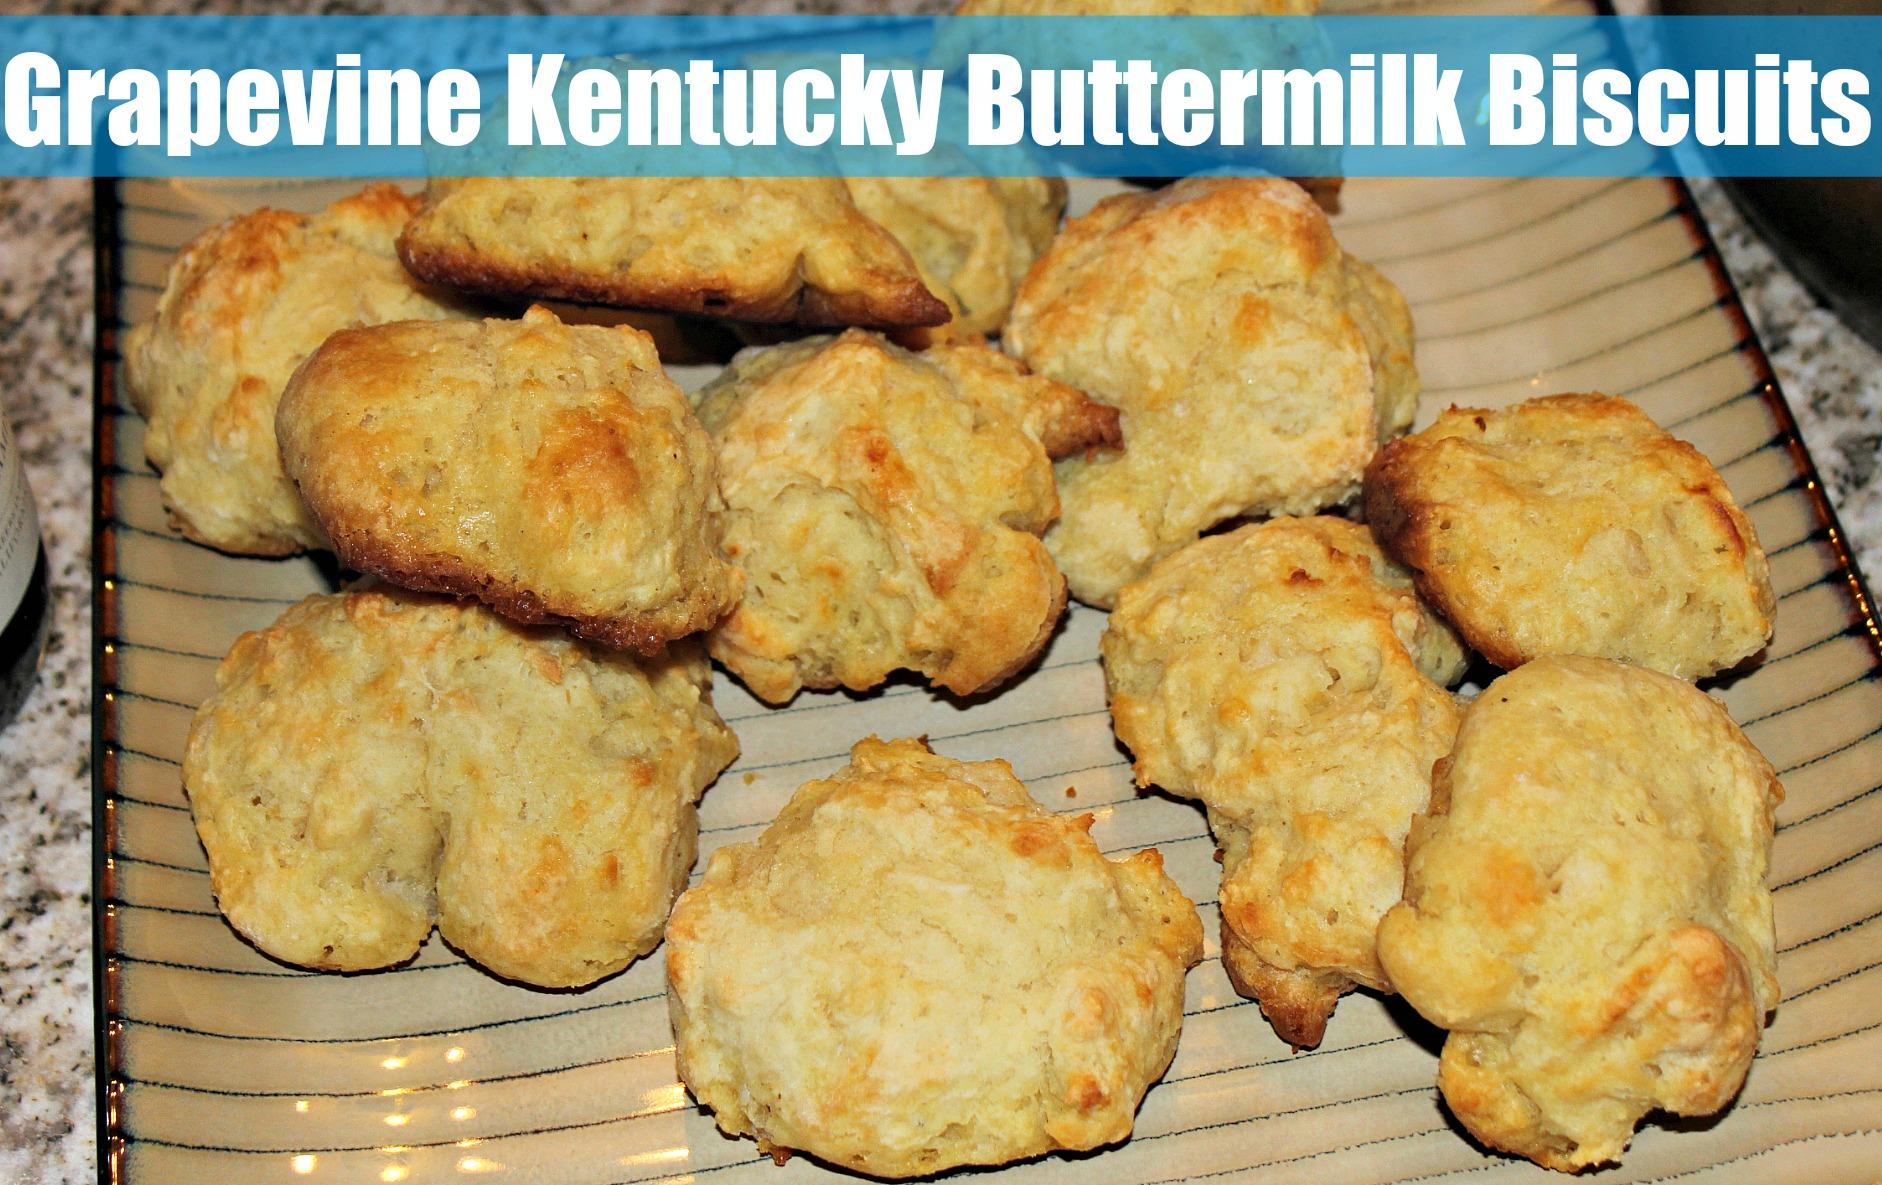 Grapevine Kentucky Buttermilk Biscuits